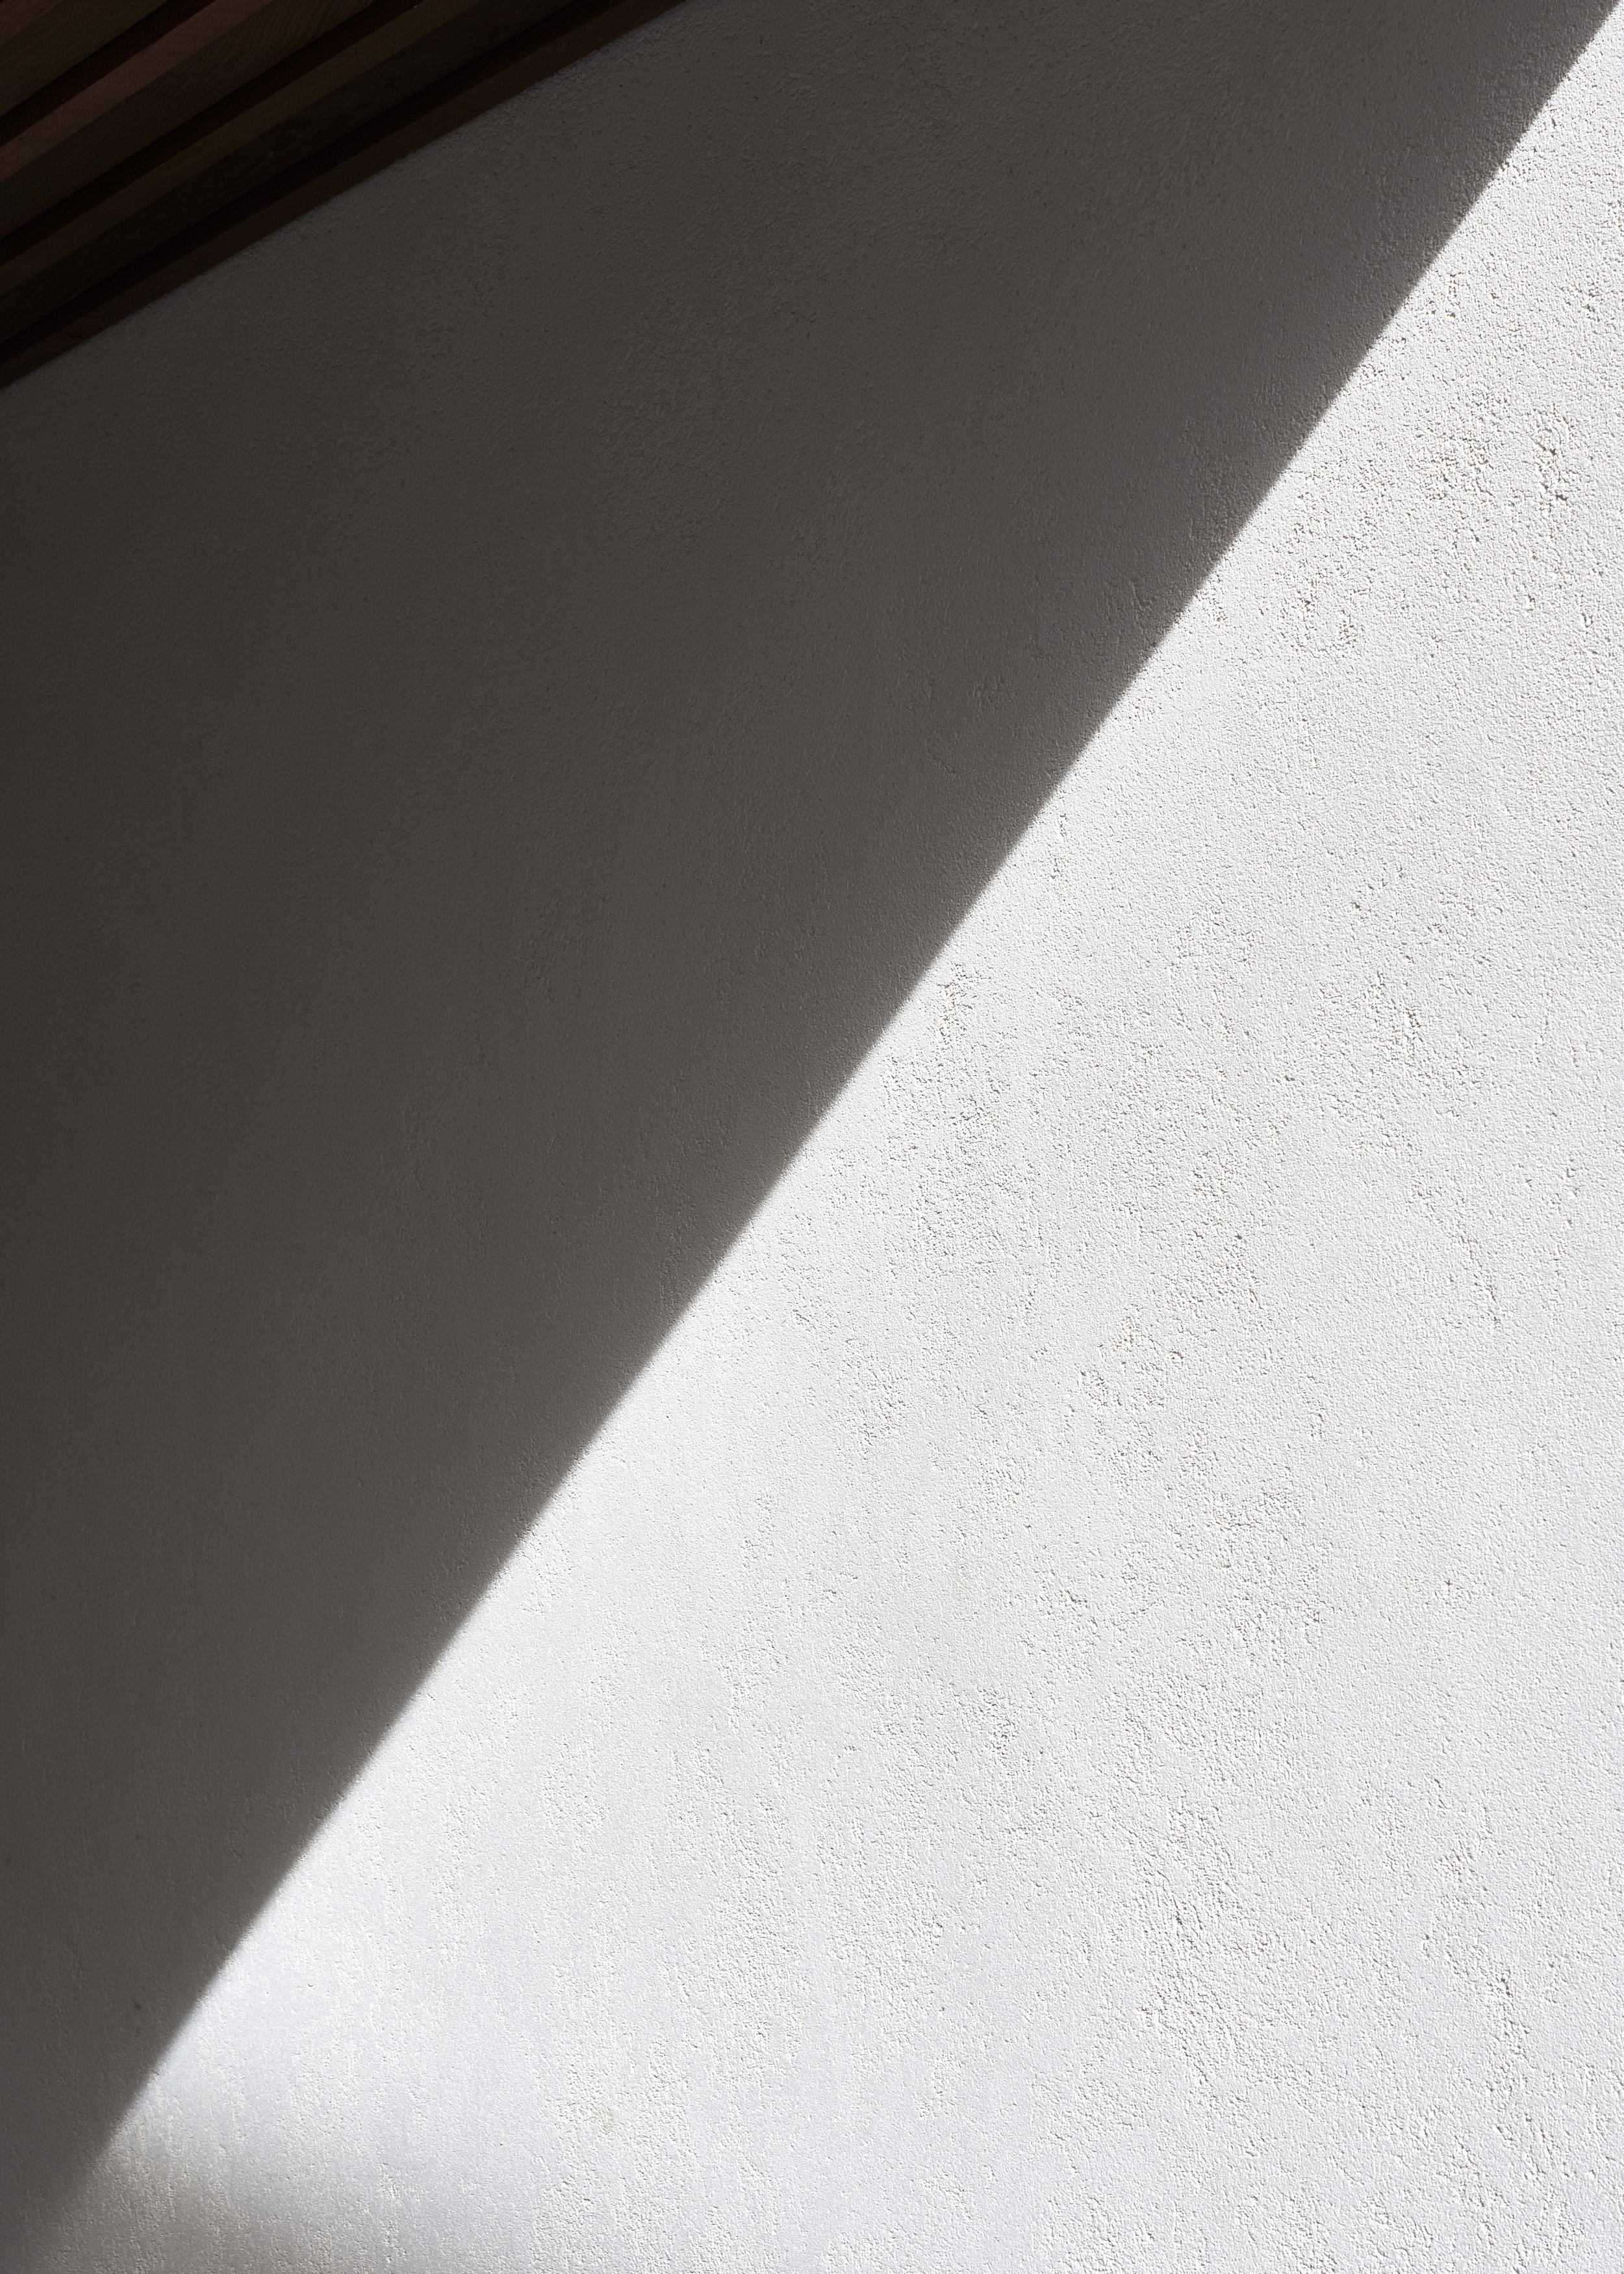 LIGHTHOUSE_WALK1011_RT.jpg